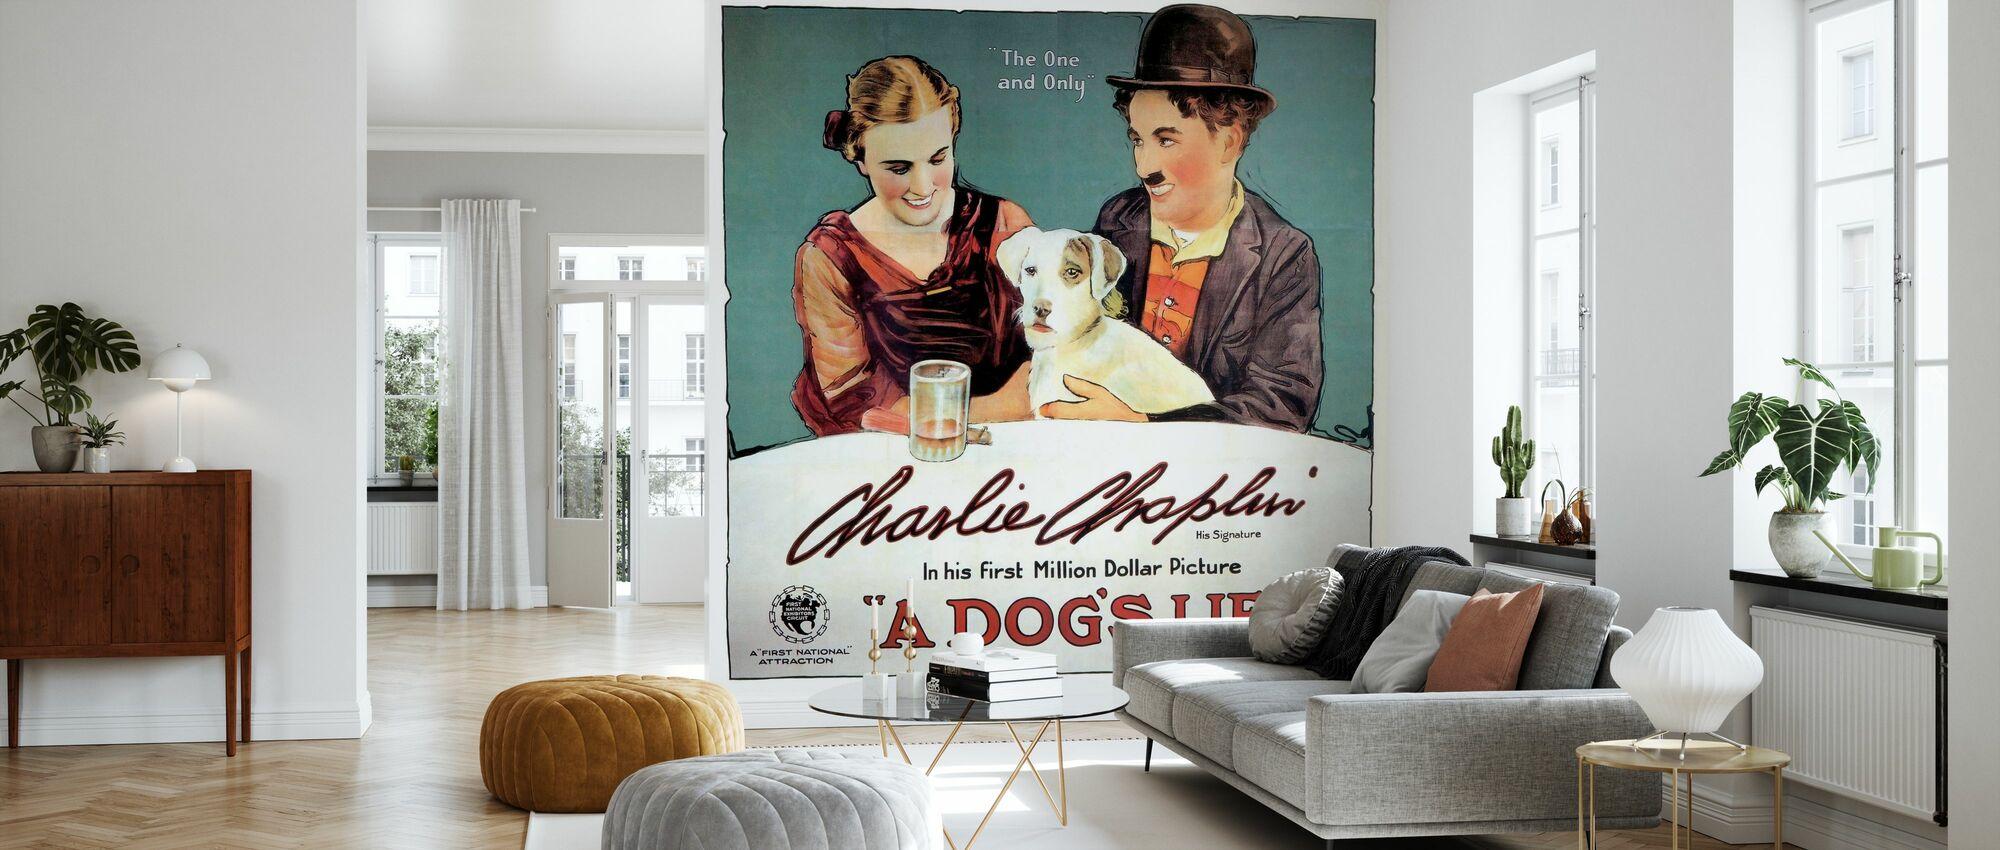 Dogs Life - Infographics - Wallpaper - Living Room